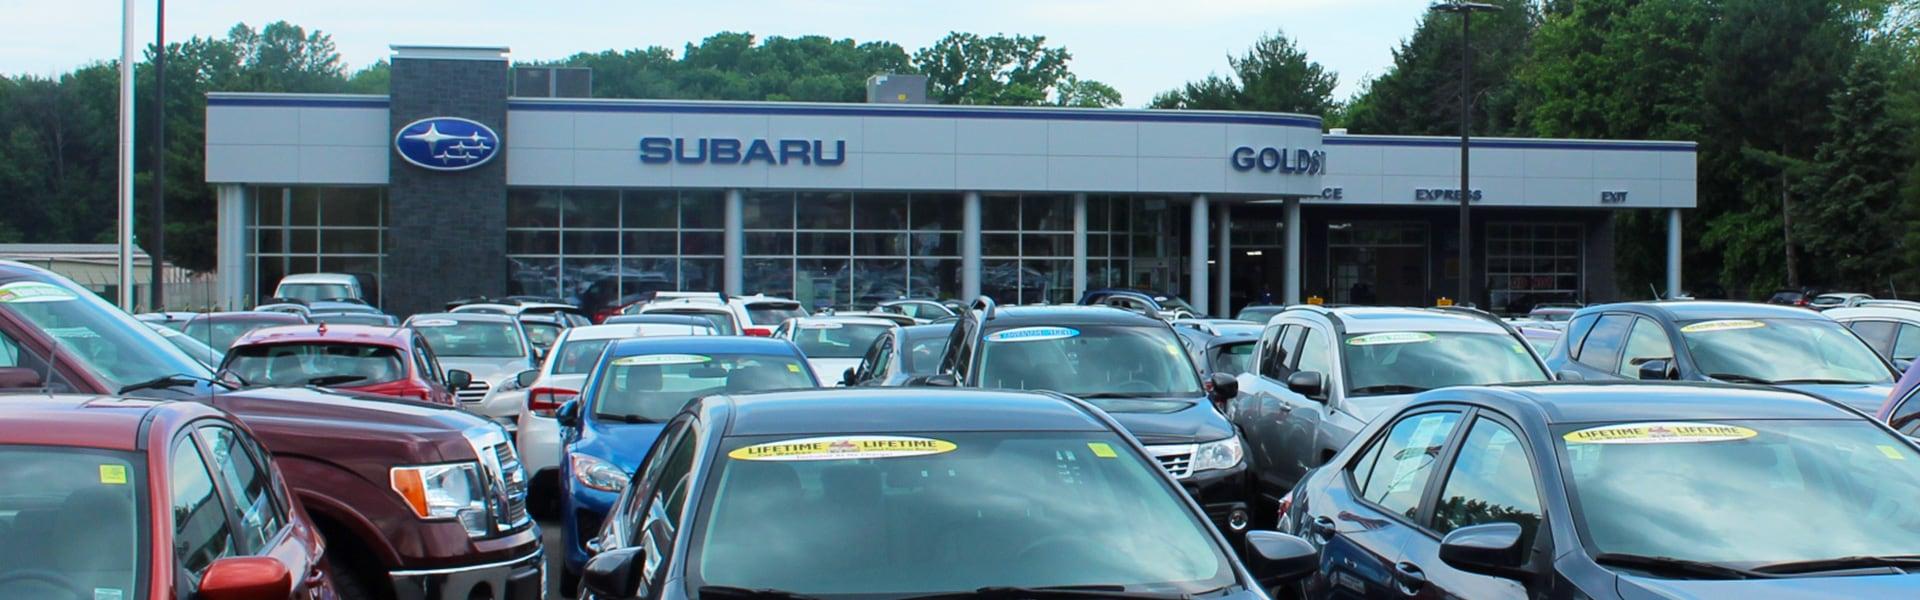 Subaru Dealer Near Me >> Albany Subaru Dealer In Albany Ny Colonie Schenectady Troy Subaru